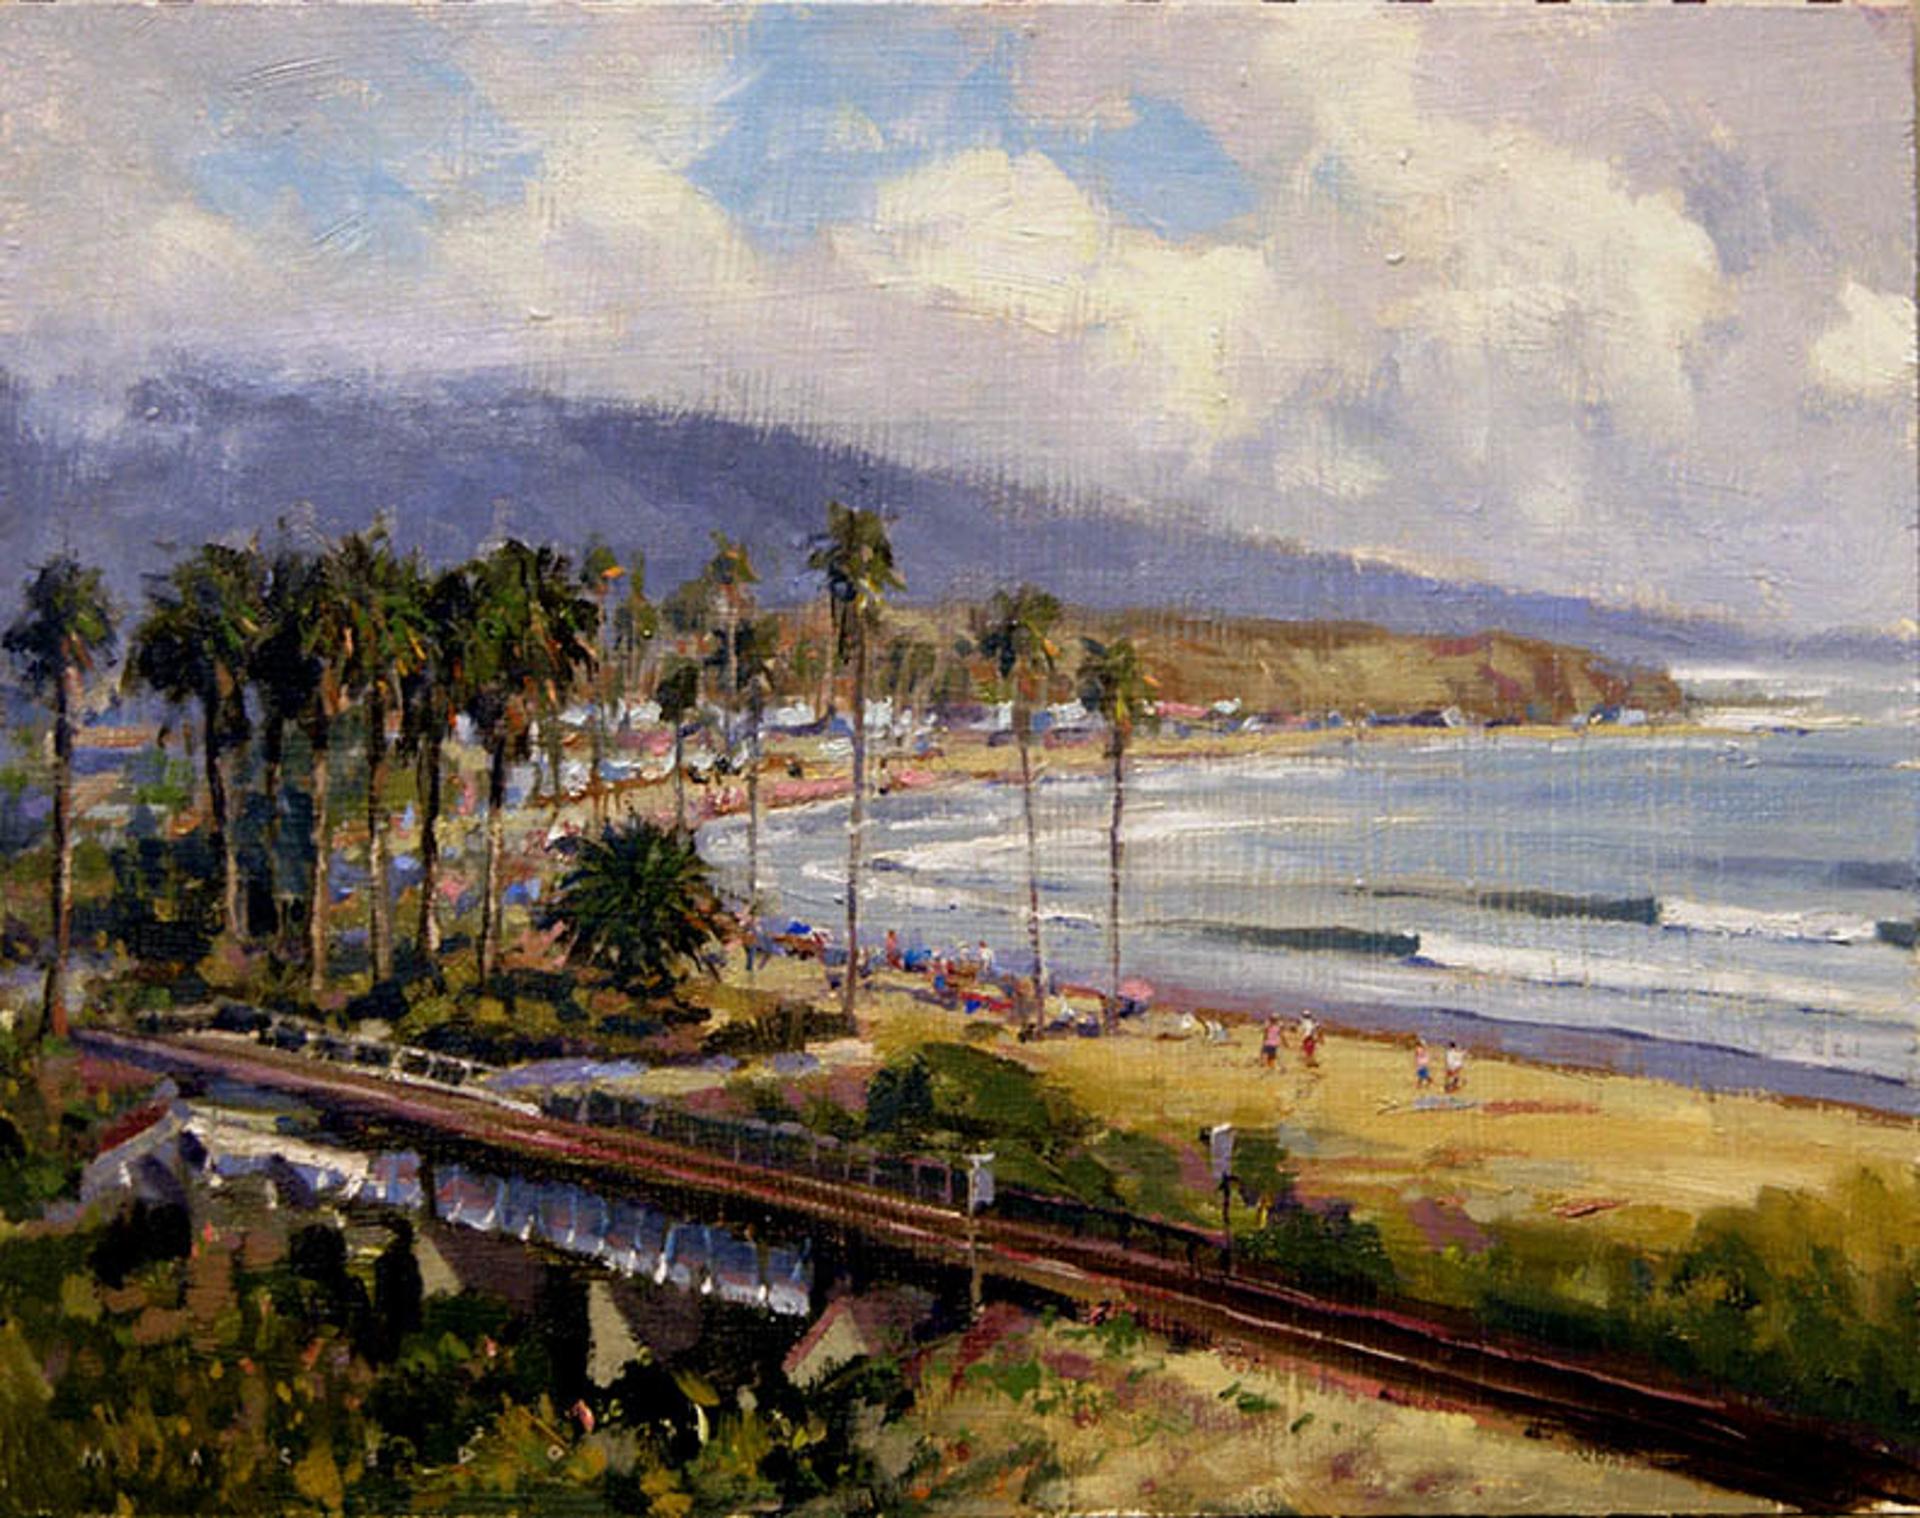 Trestles, San Clemente by Ronaldo Macedo